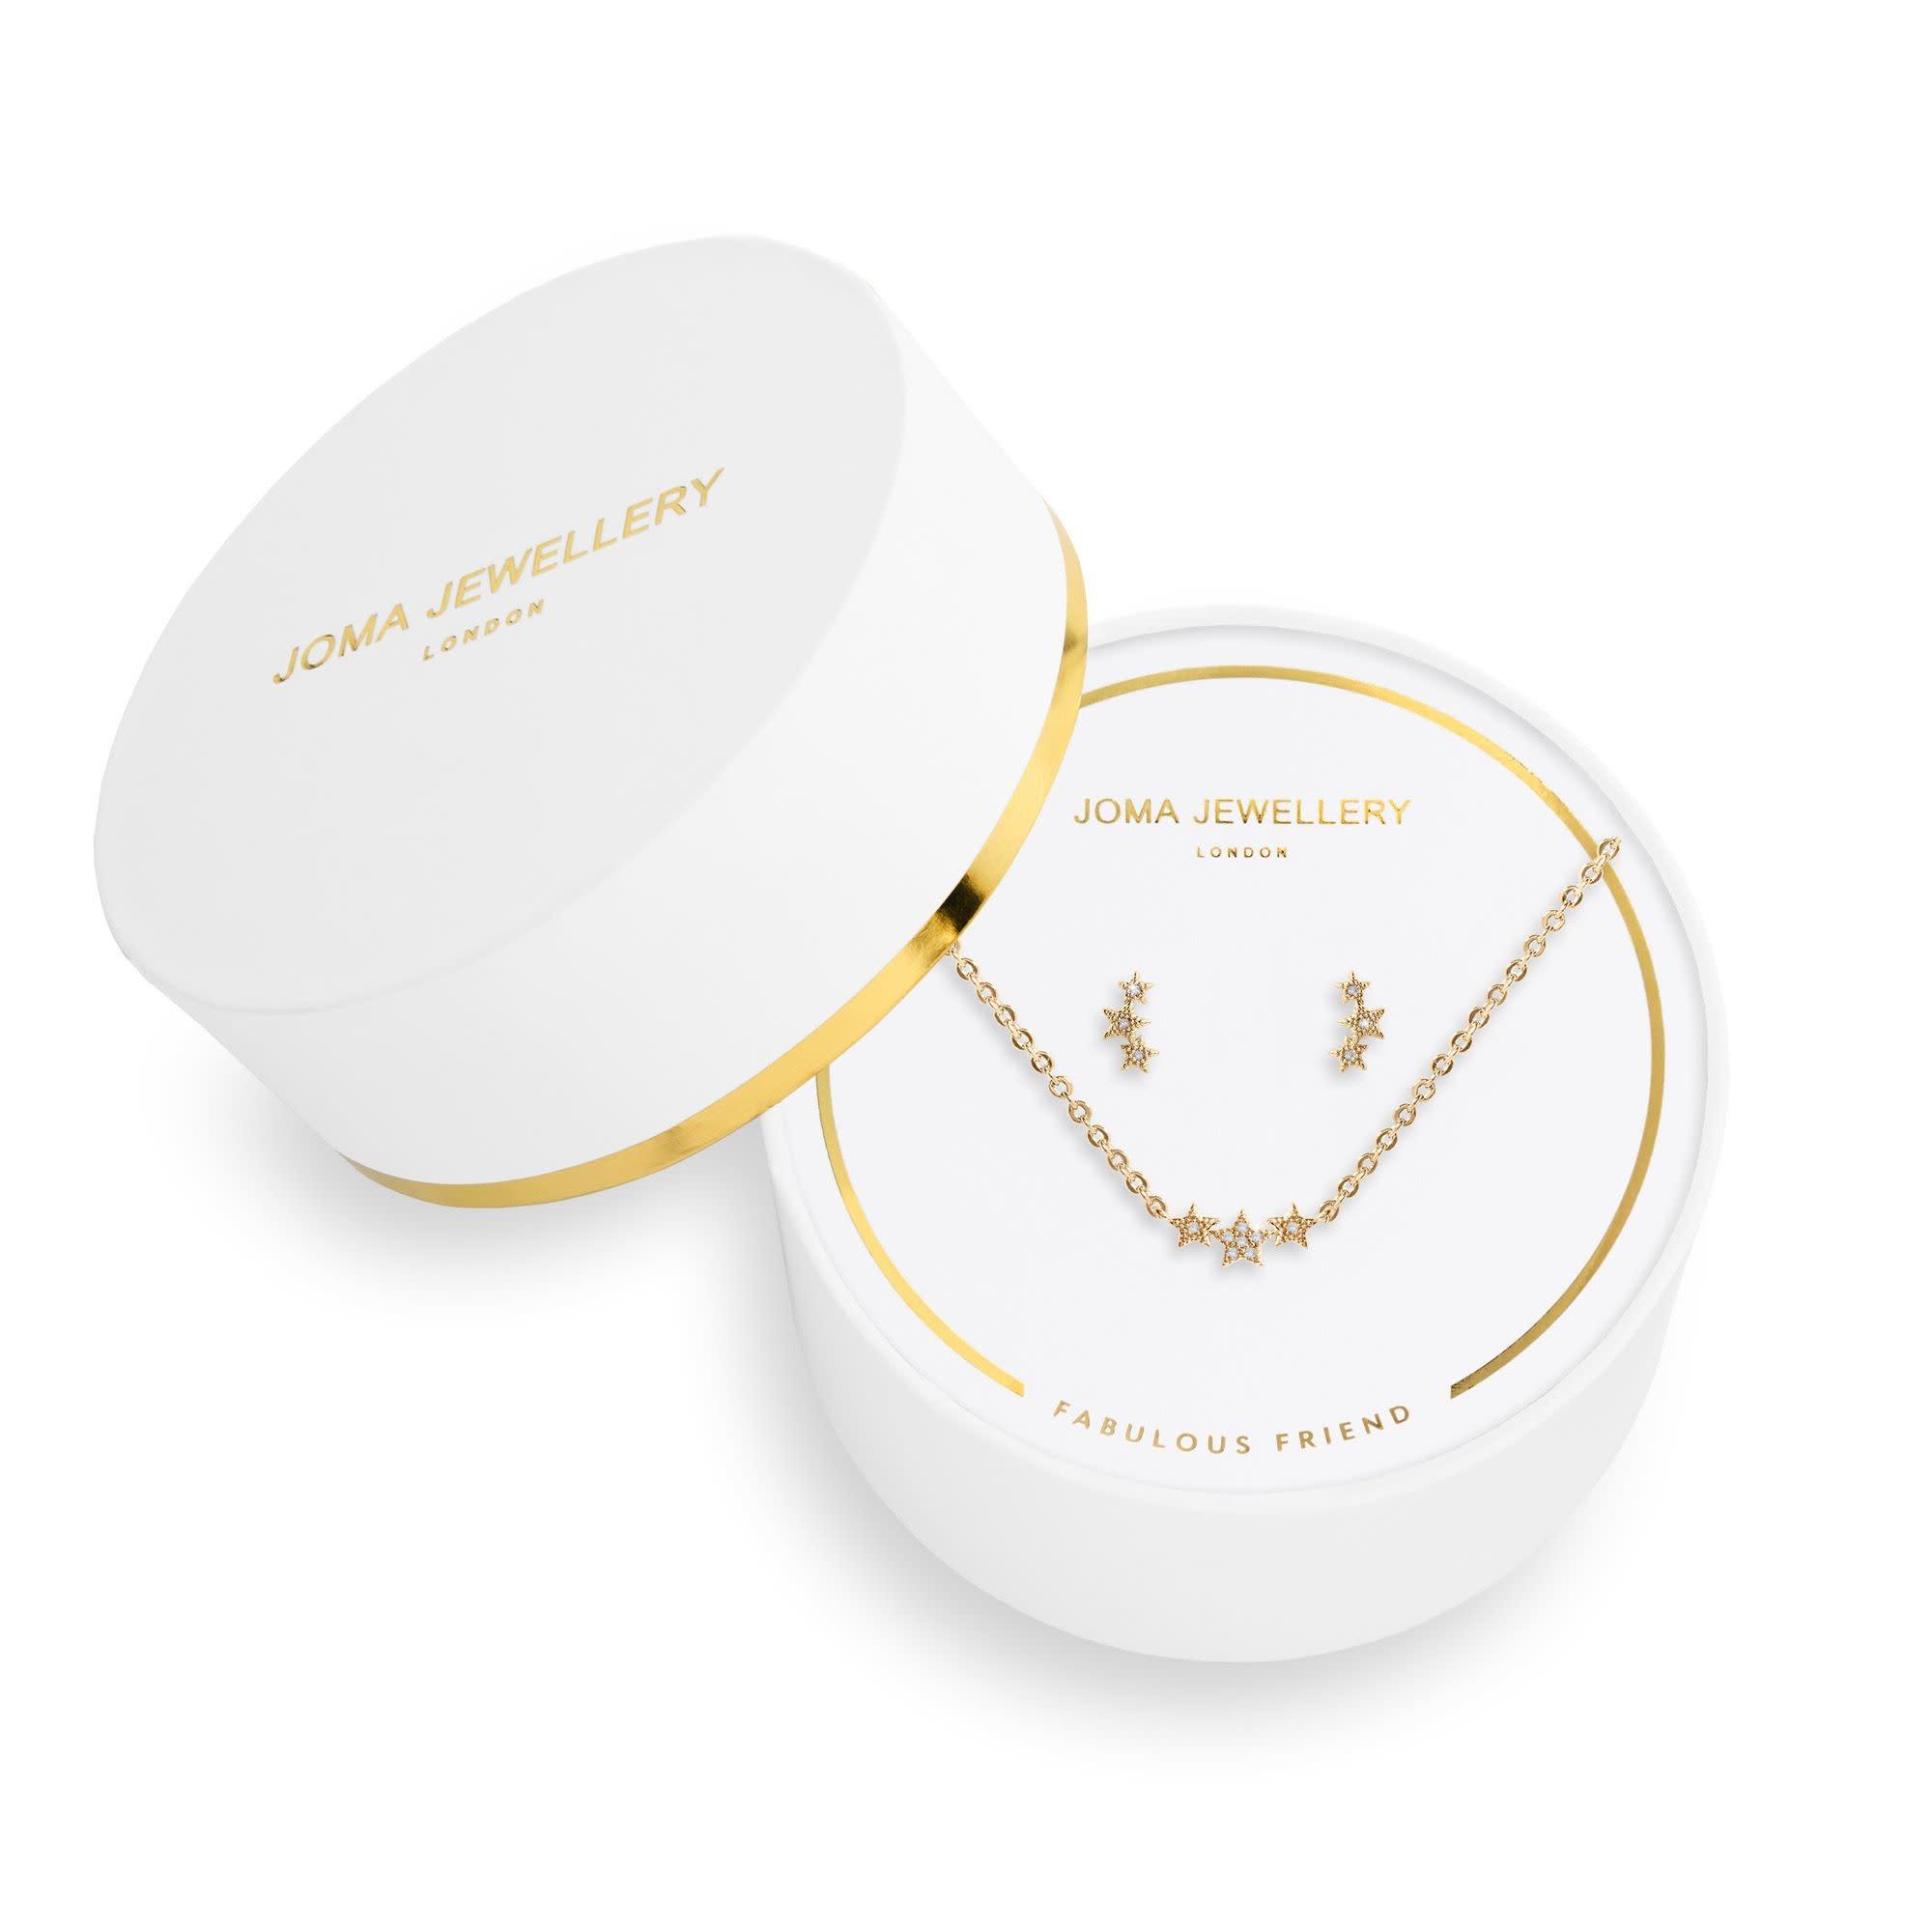 Joma Jewellery Juwelenset - Fabulous Friend - Ketting & Oorbellen Goud